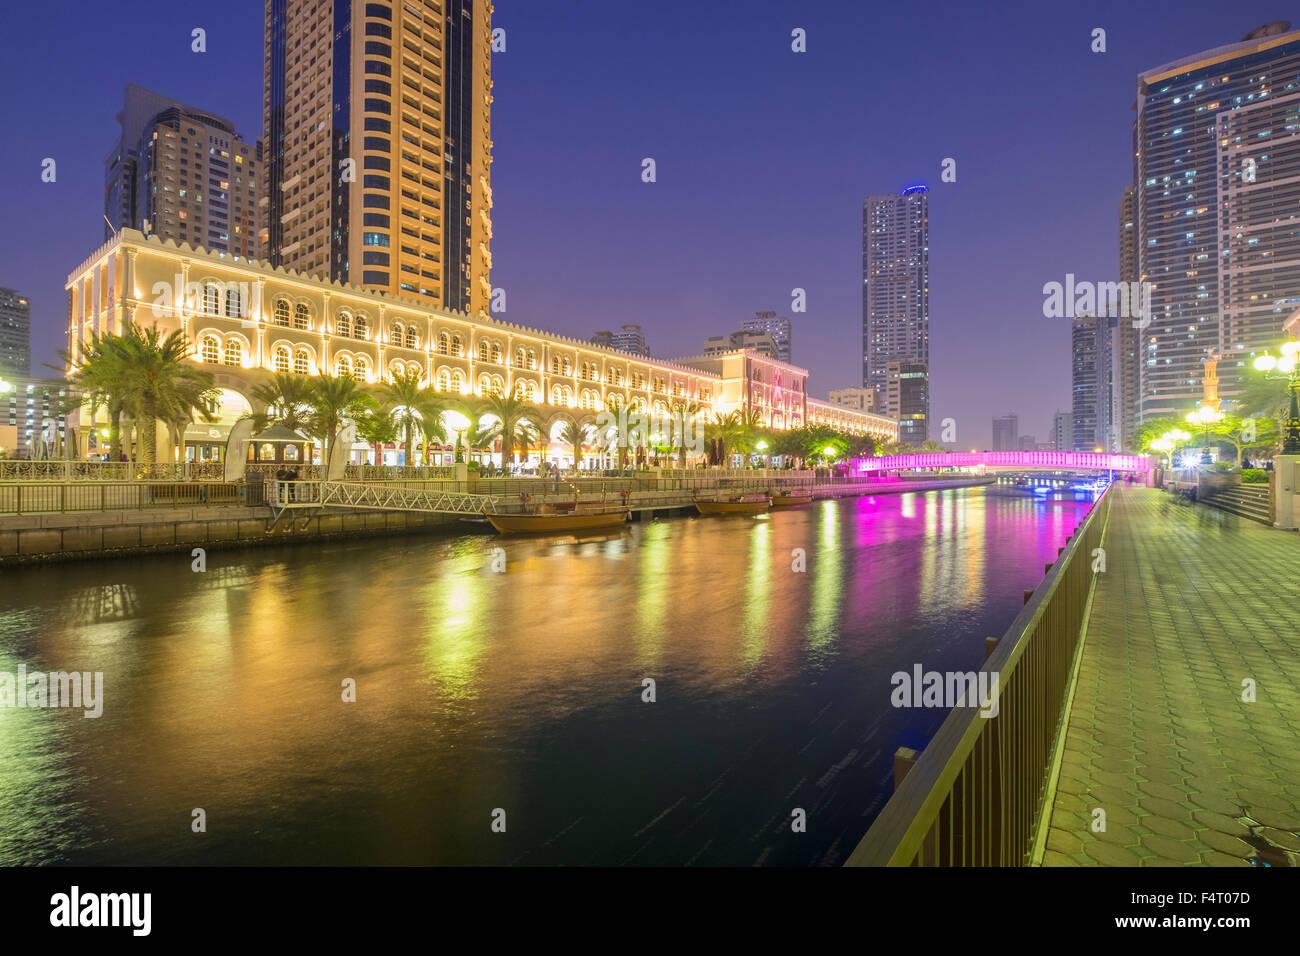 Evening viewof Al Qasba entertainment district in Sharjah United Arab Emirates - Stock Image